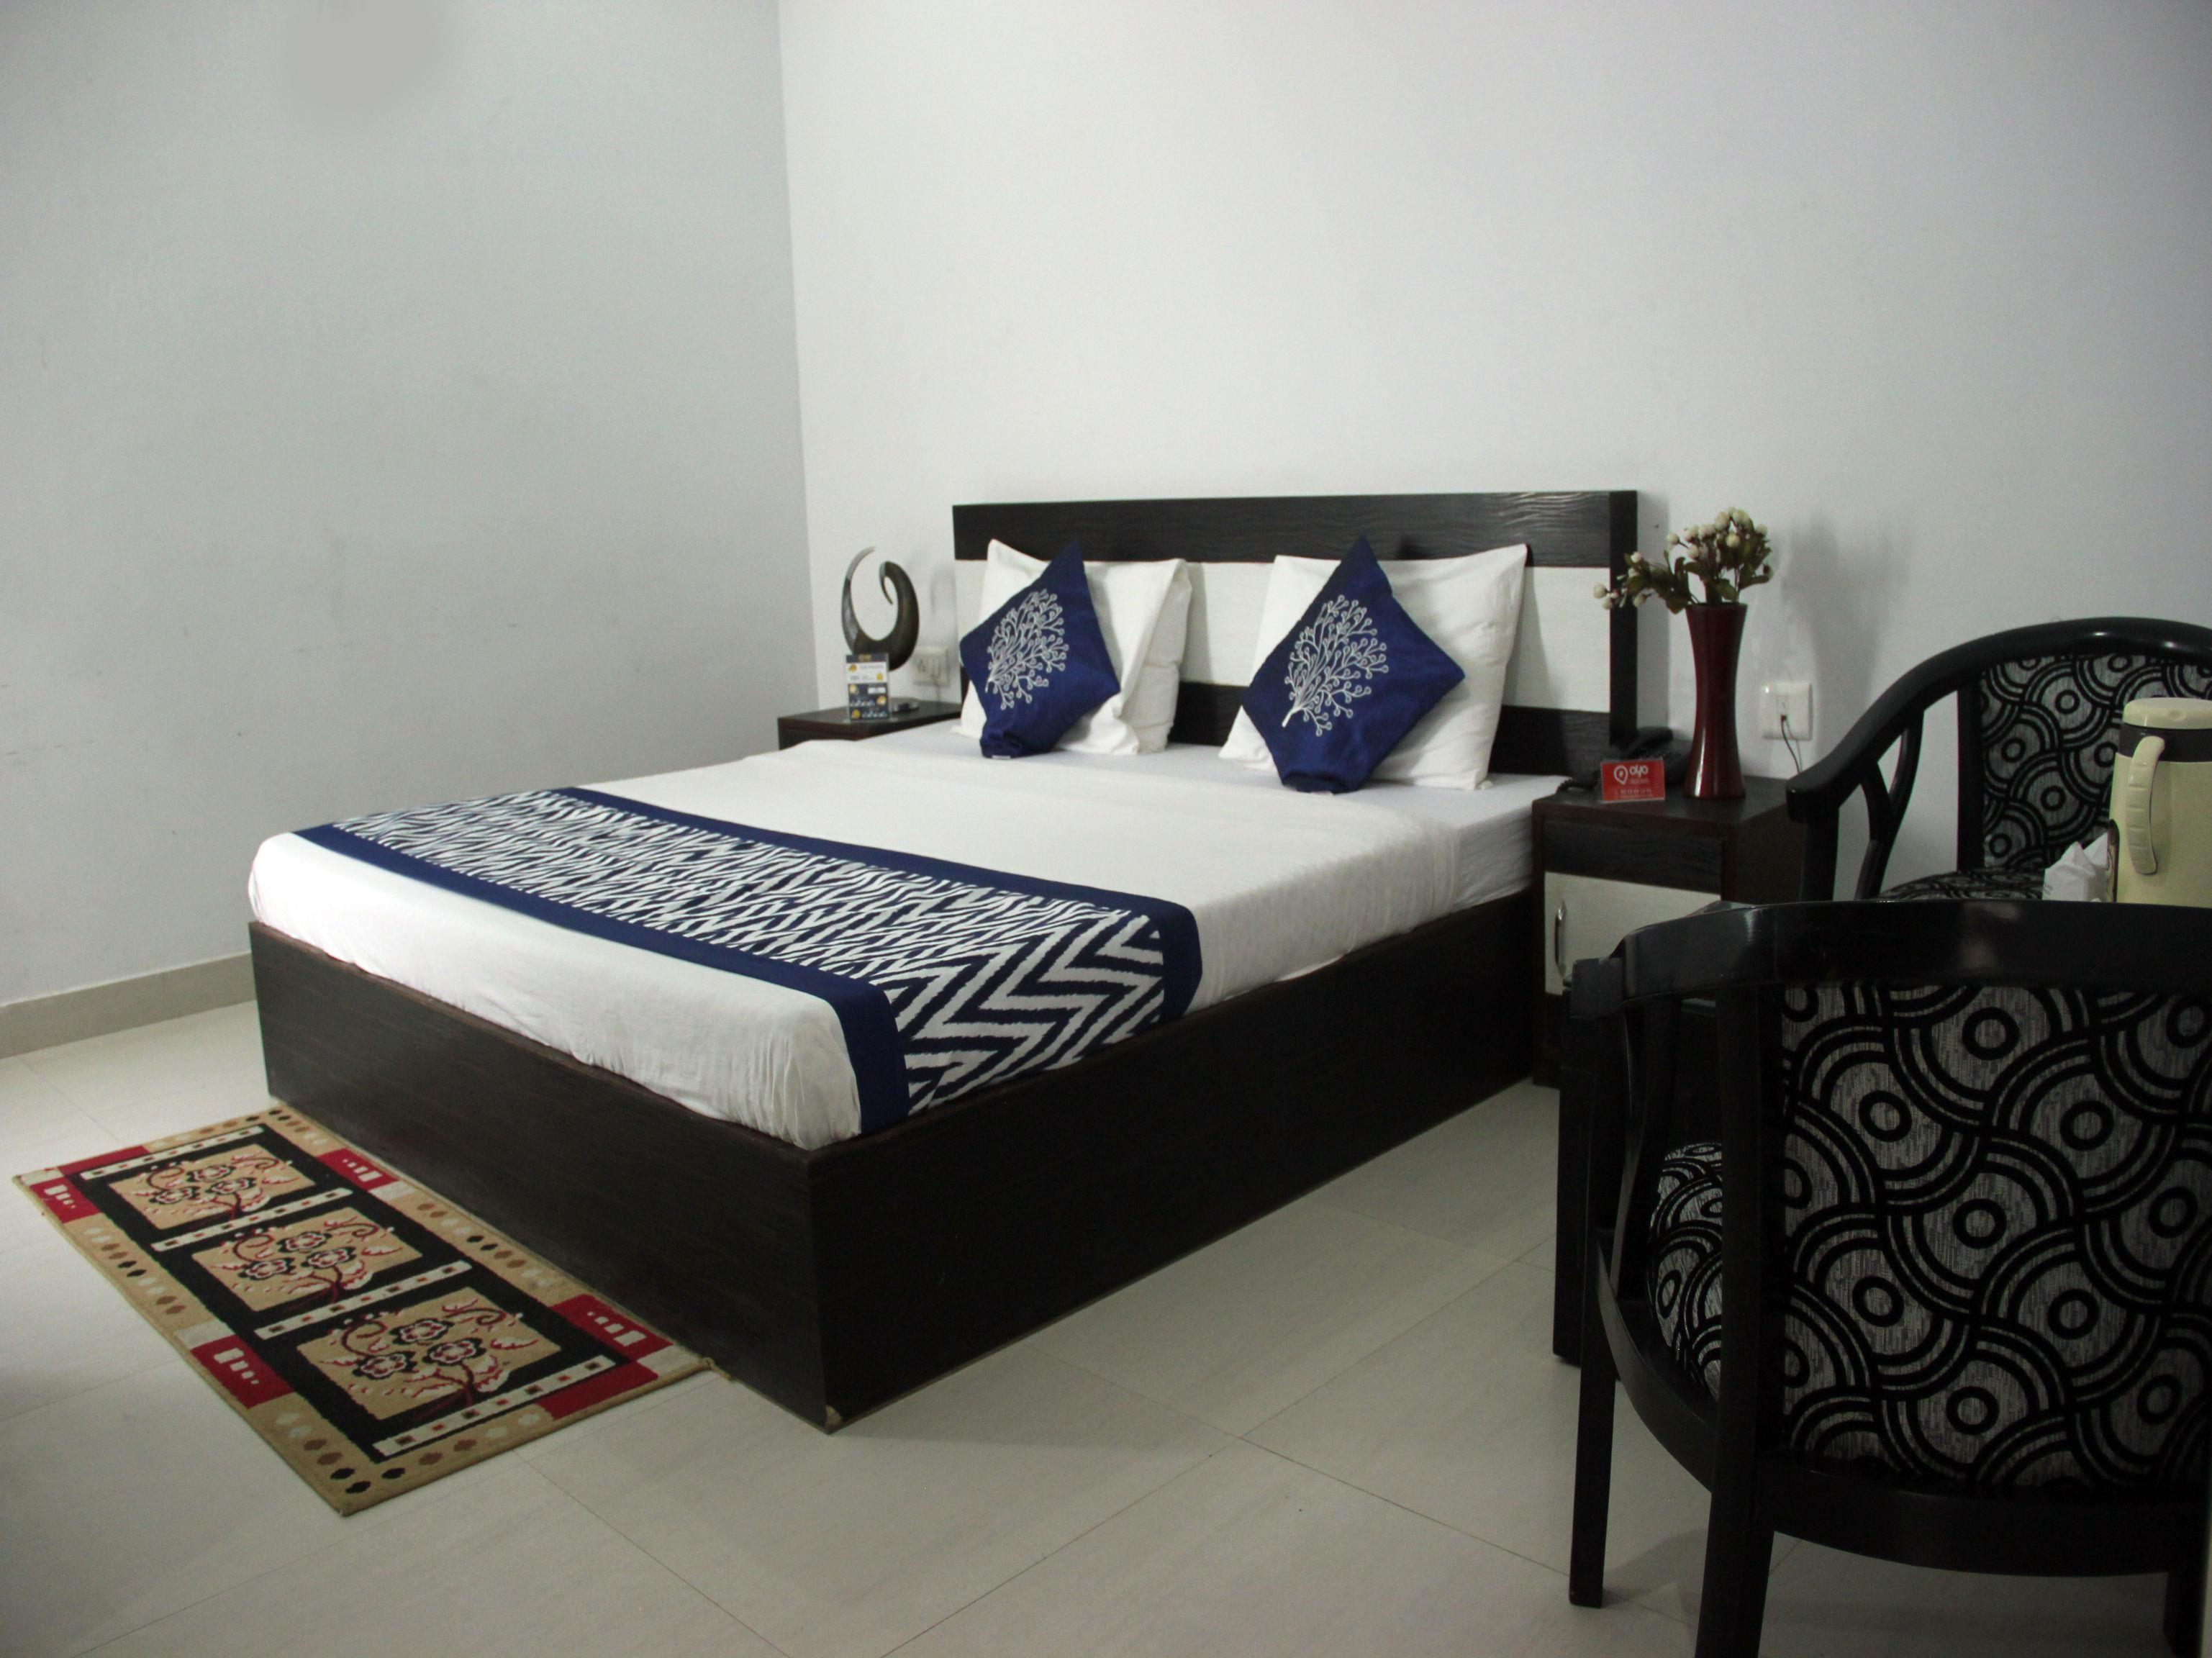 Oyo Premium Tapovan Rishikesh, India